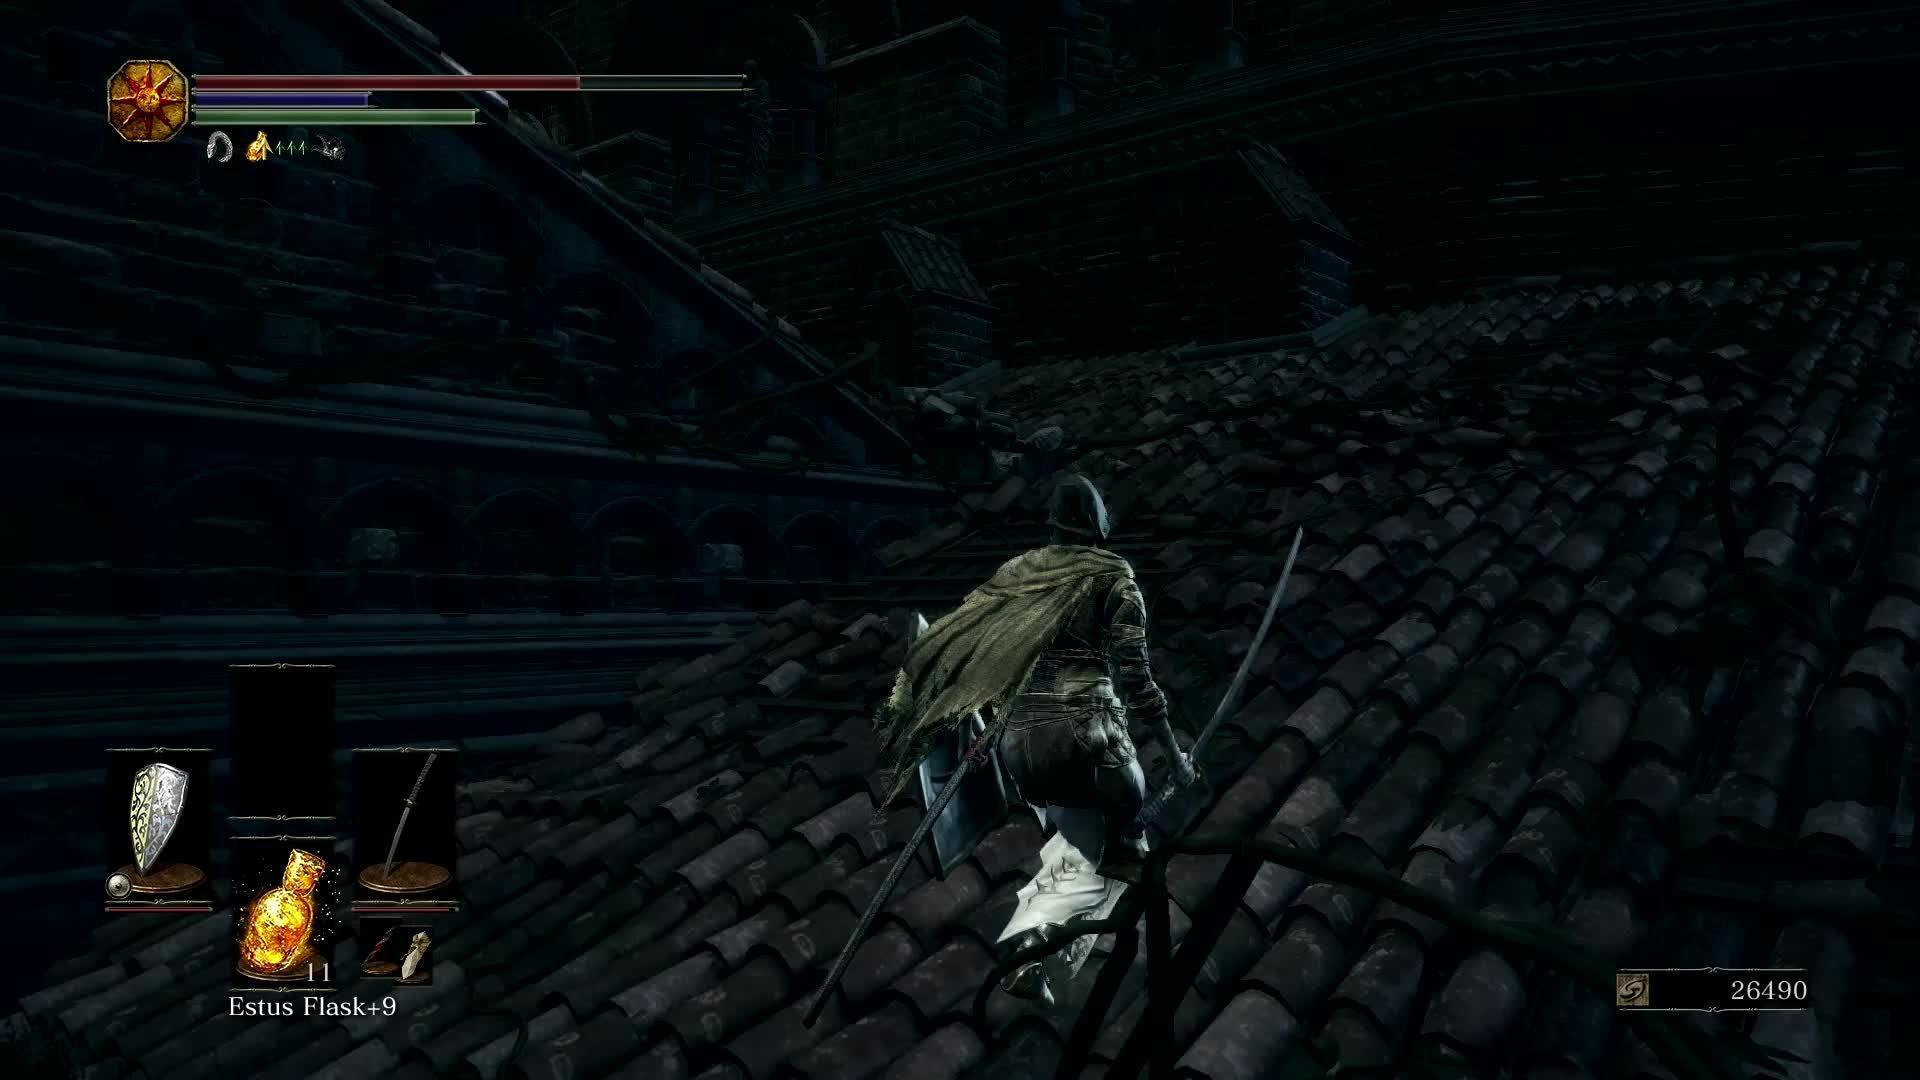 dark souls 3, darksouls3, video games, Goodbye, friend GIFs